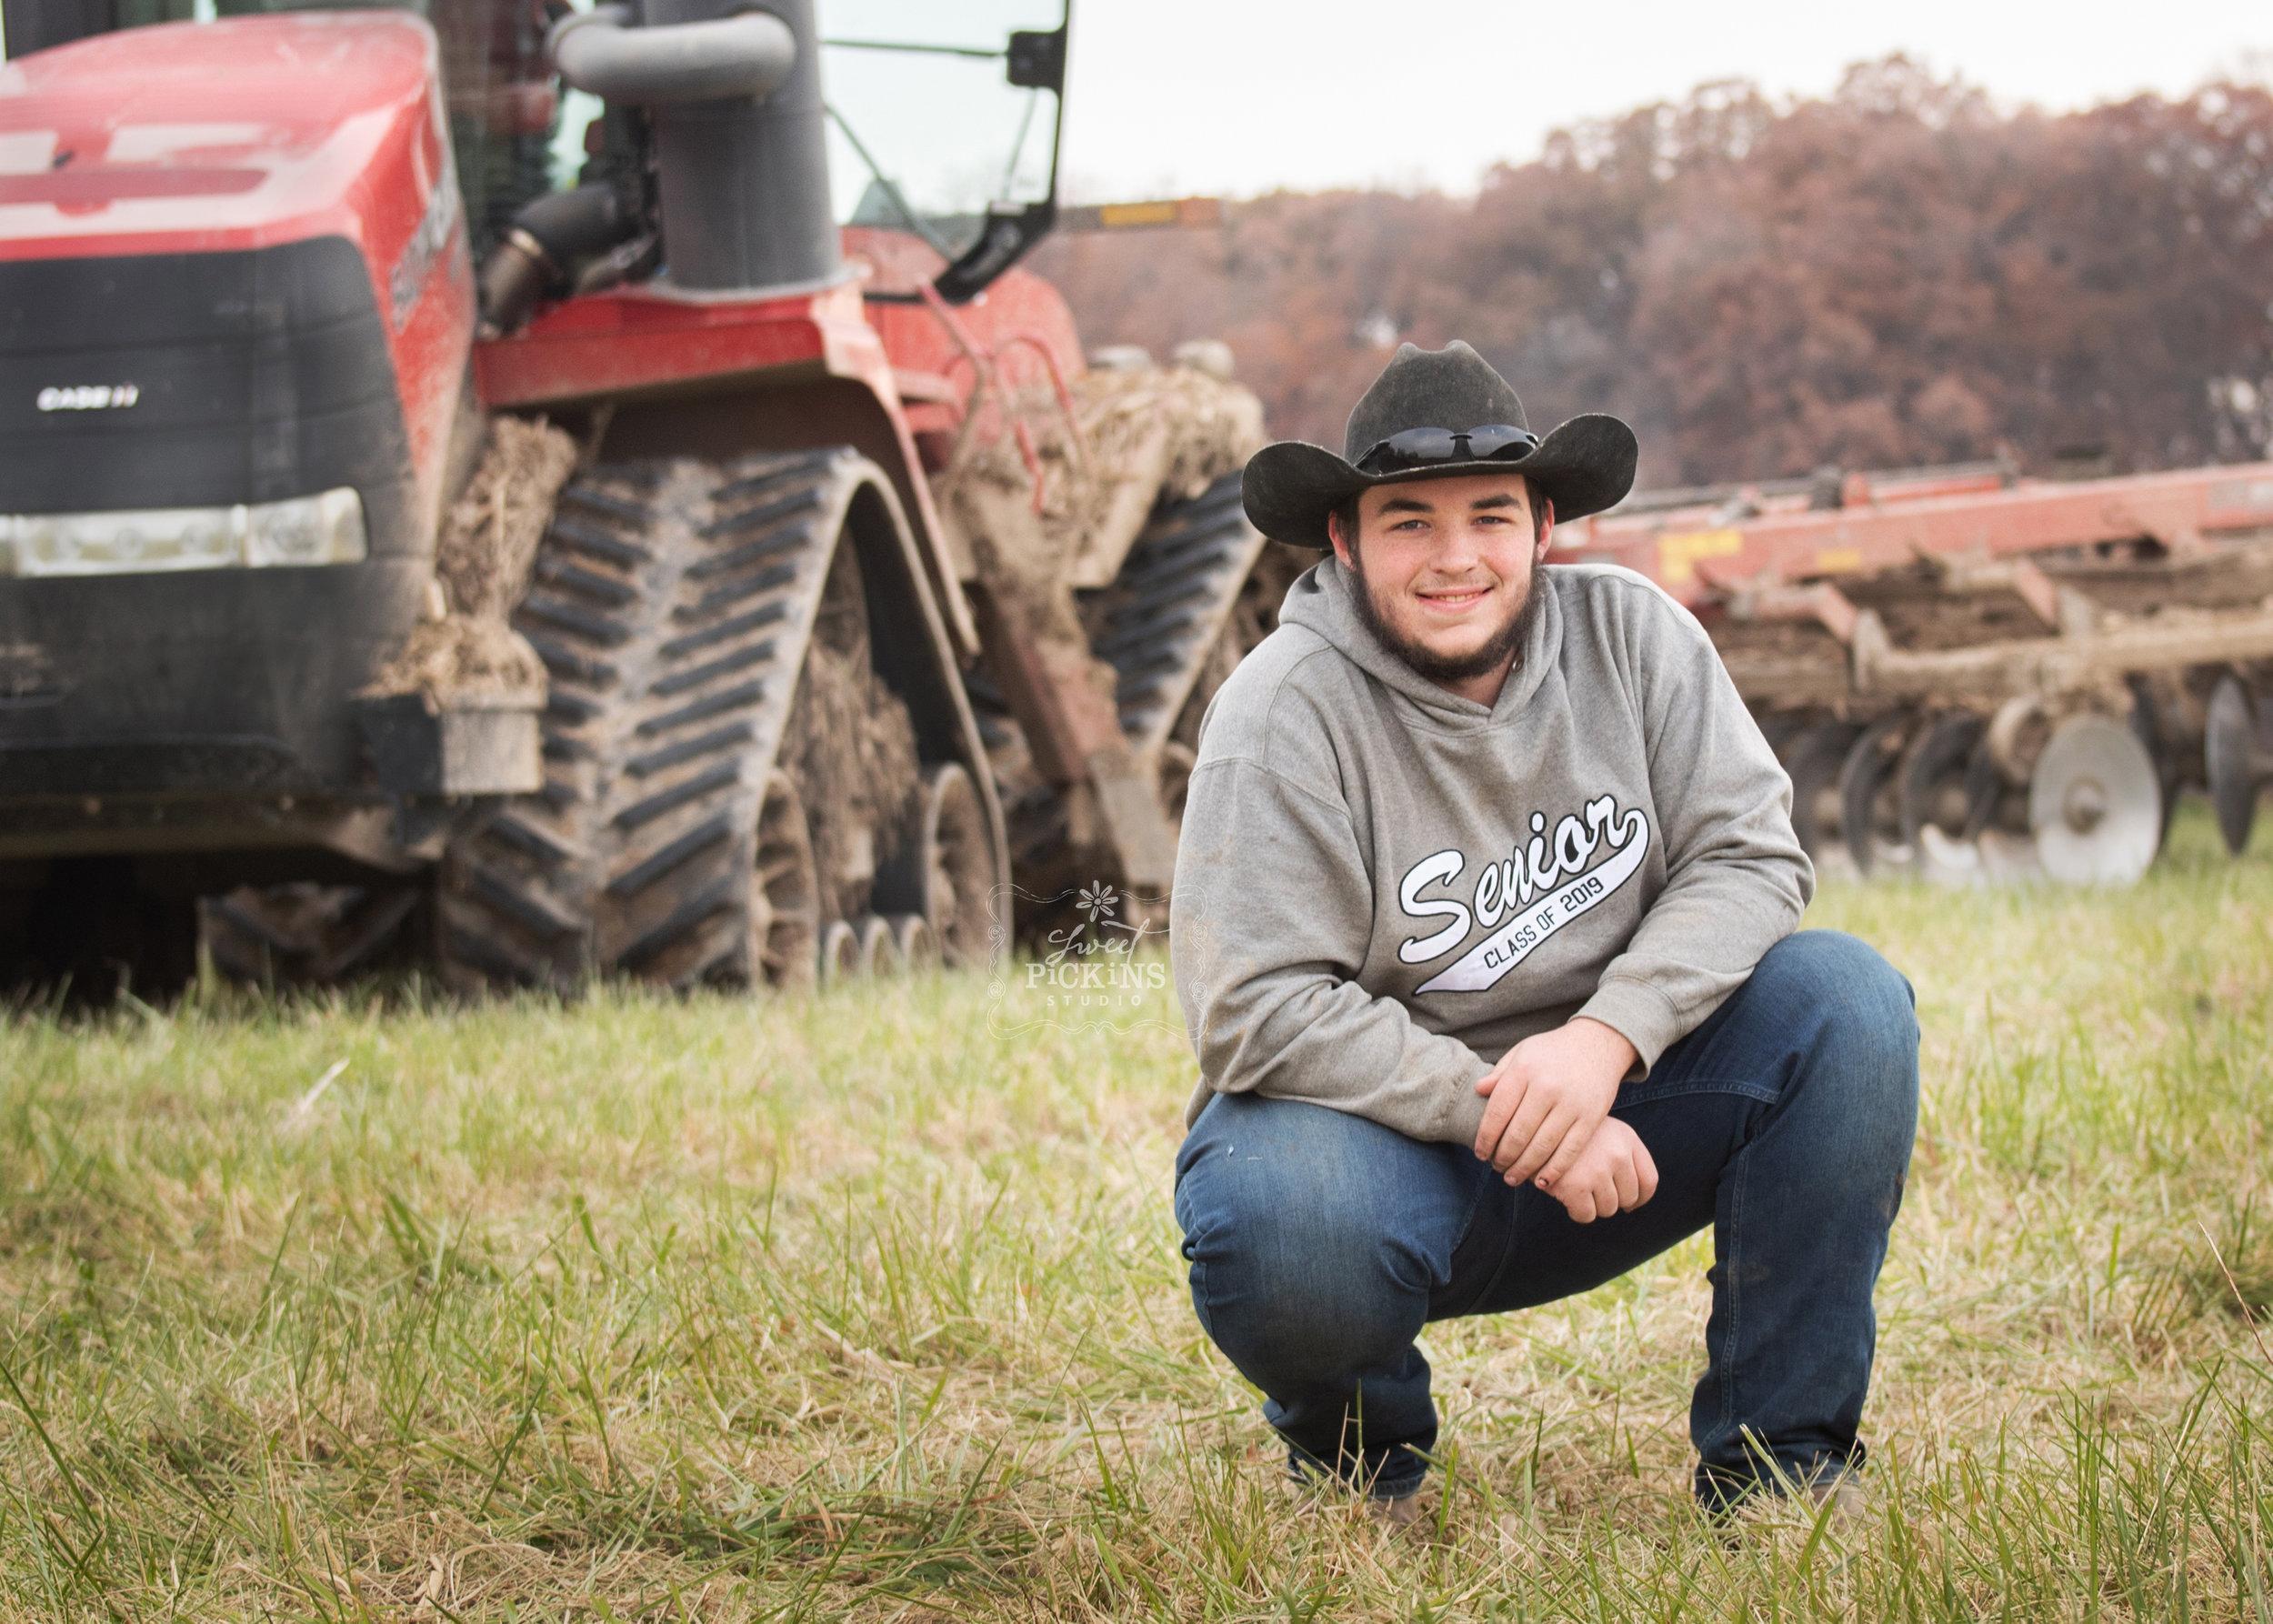 Farm Senior Portrait with Case IH Quad Trac Tractor in field | Huntington, Indiana Class of 2019